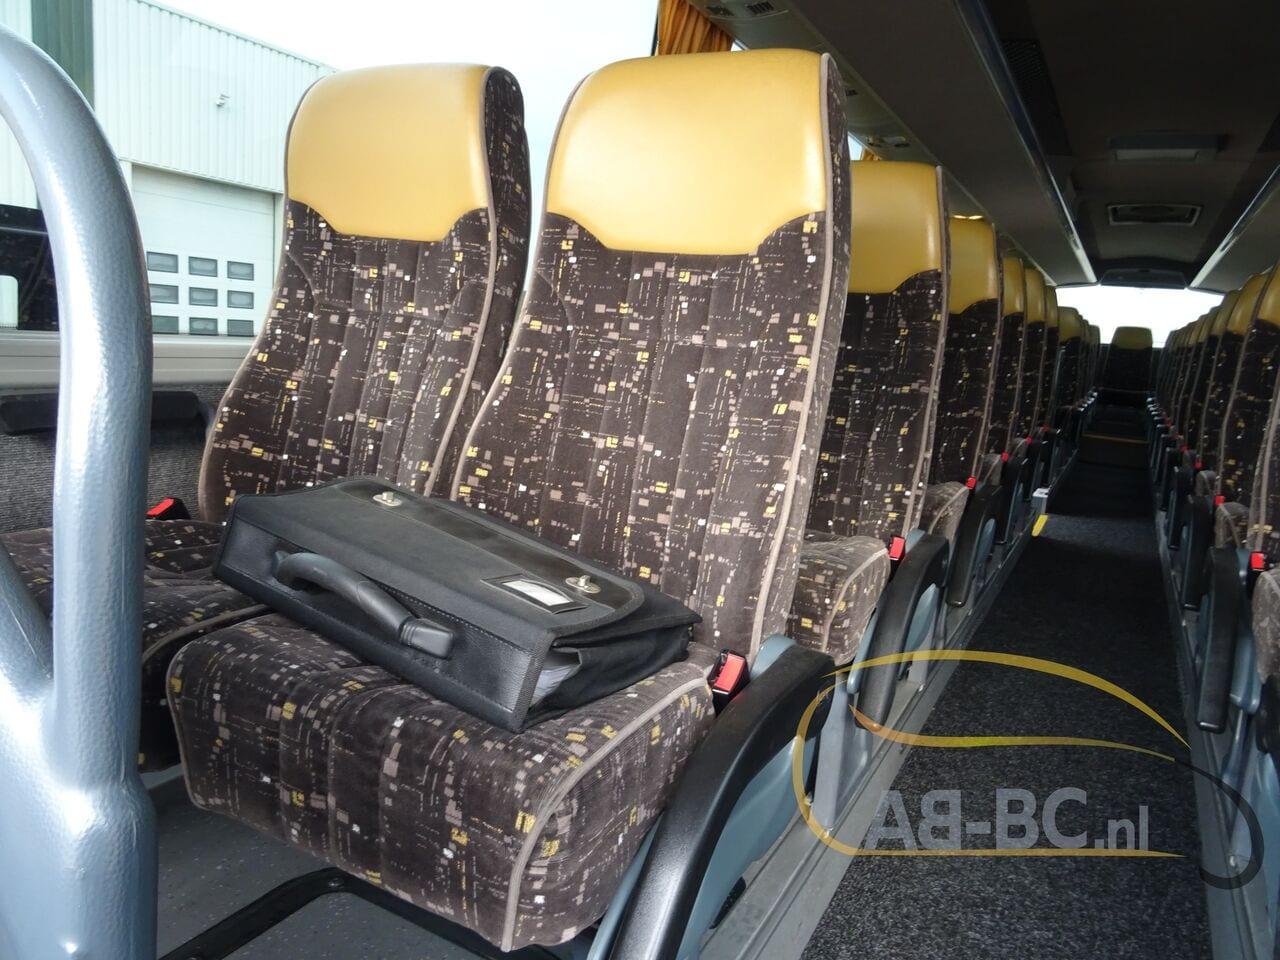 coach-busTEMSA-Safari-HD-51-Seats-EURO5-12-MTR---1614266580728486553_big_b4af3ba326c935b76f67b72bfdfa533b--19052917224730818200